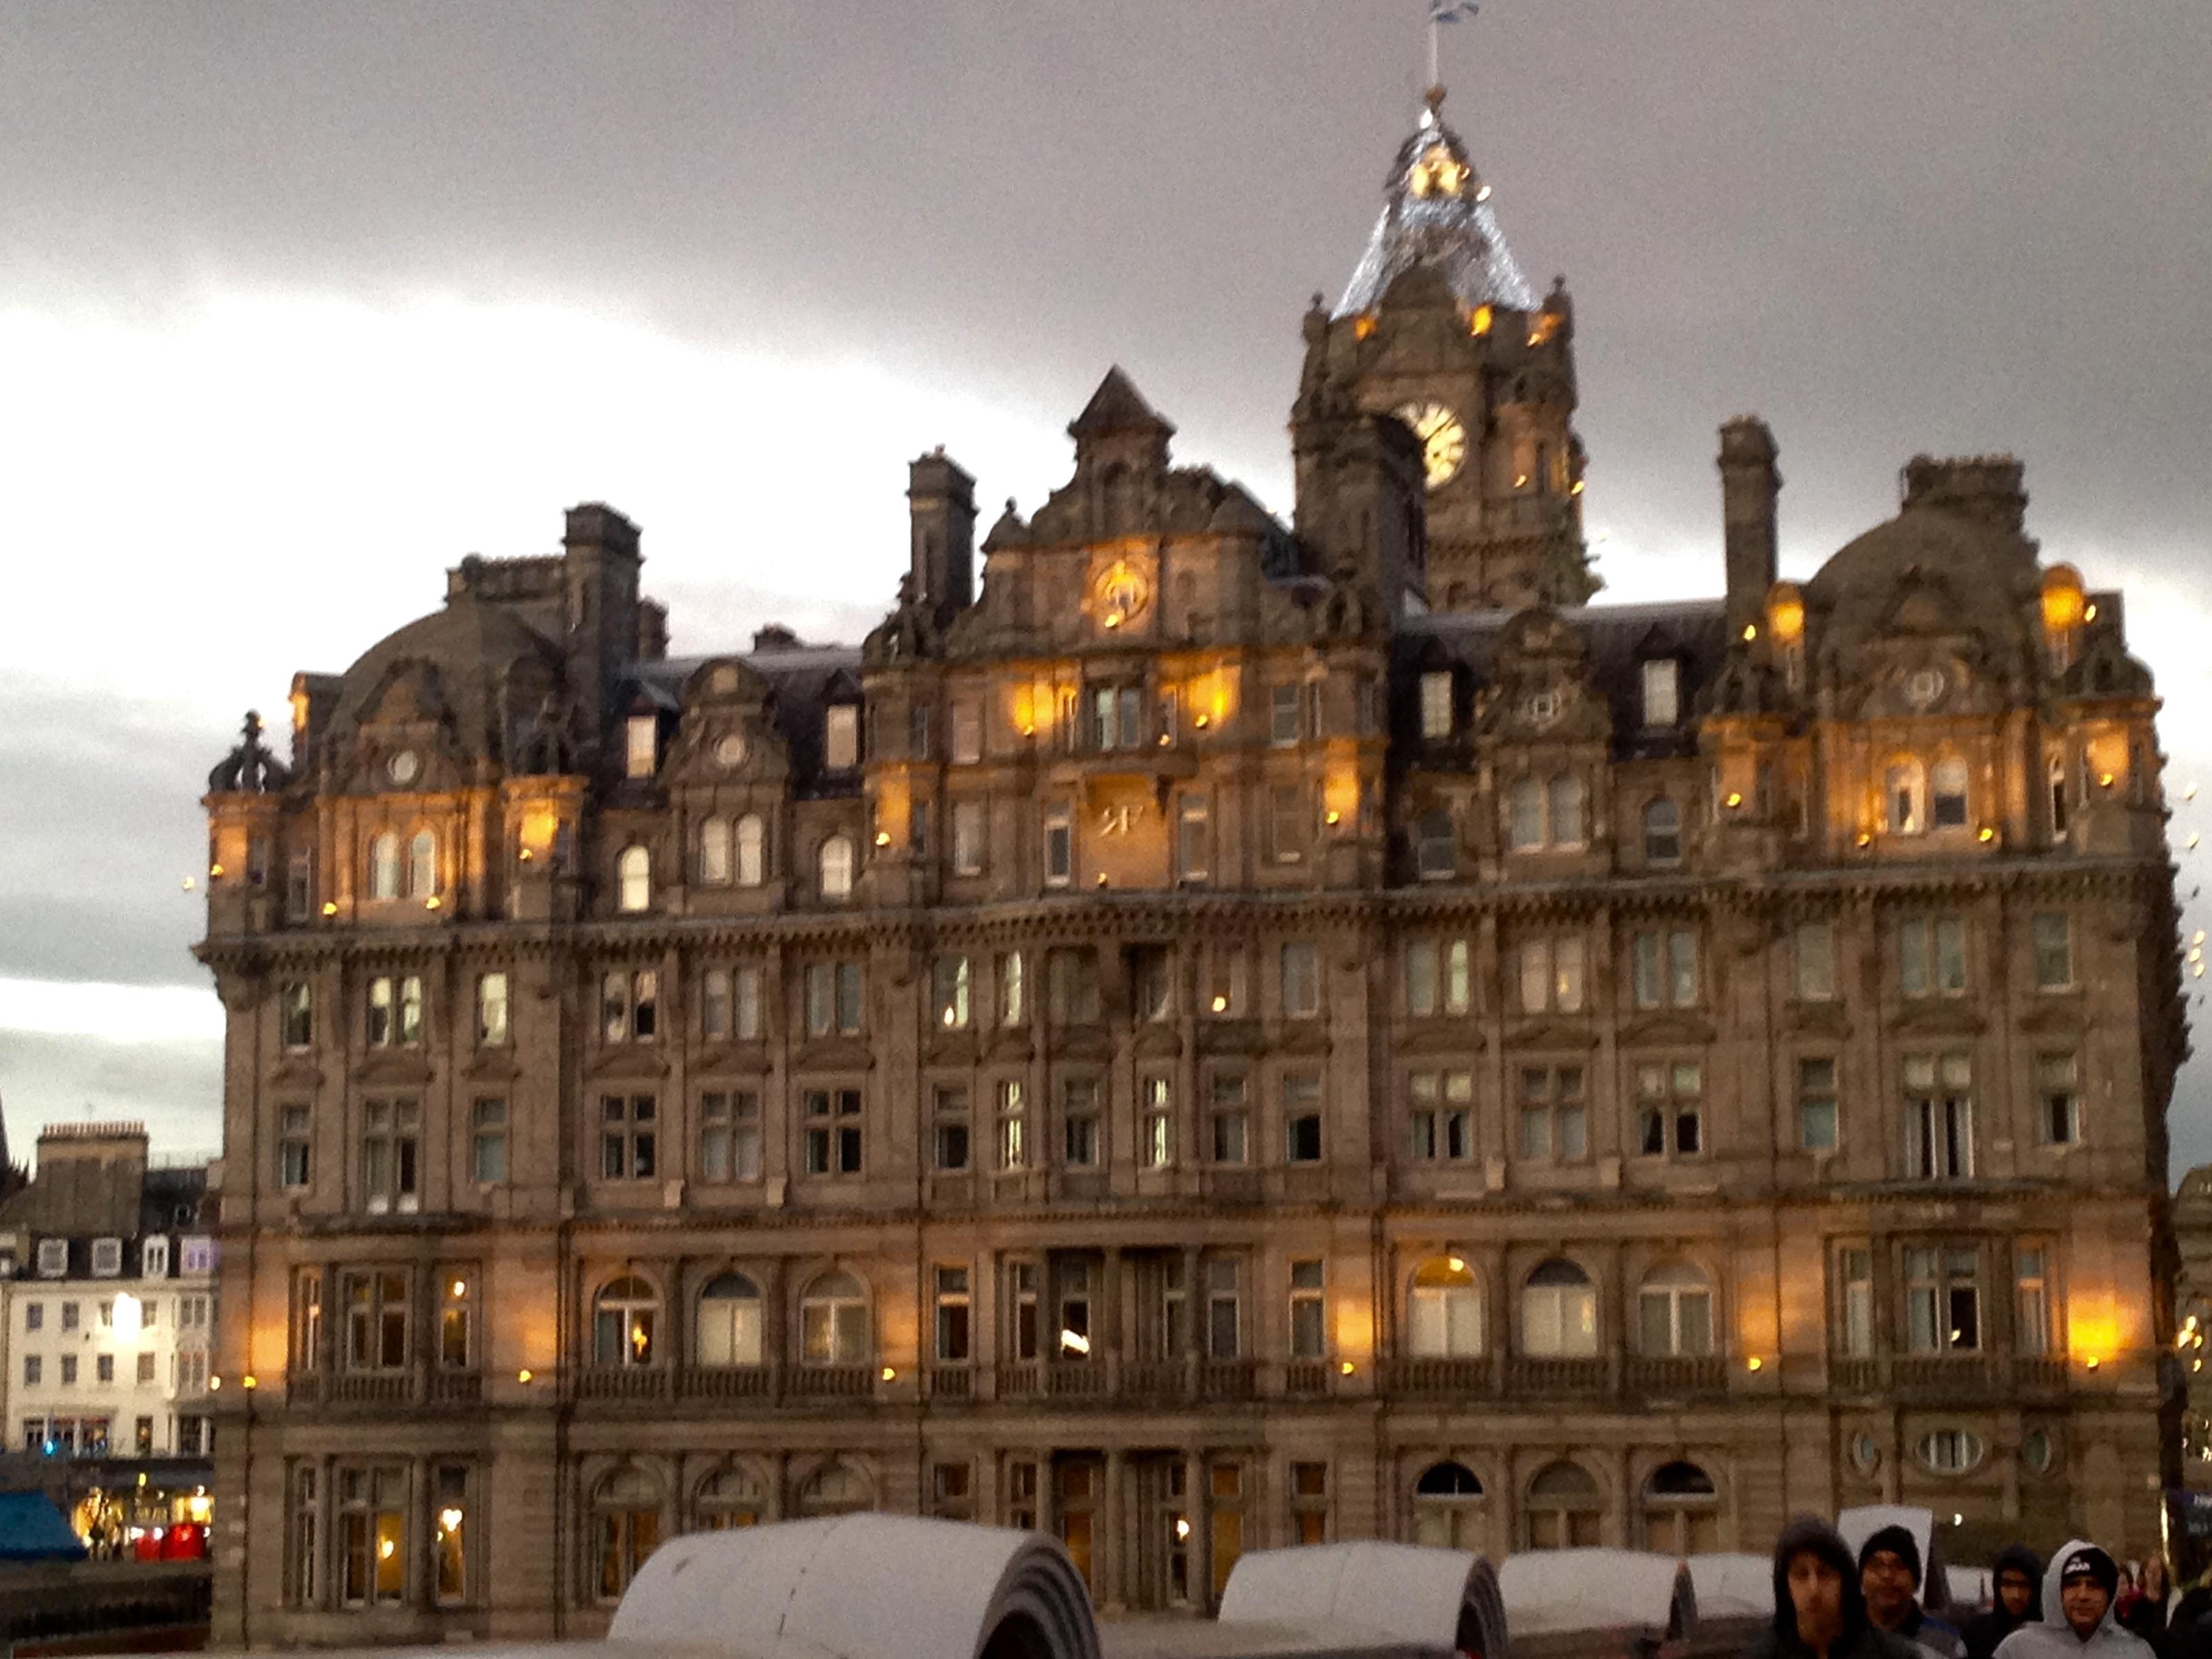 Overnight Stay in Edinburgh